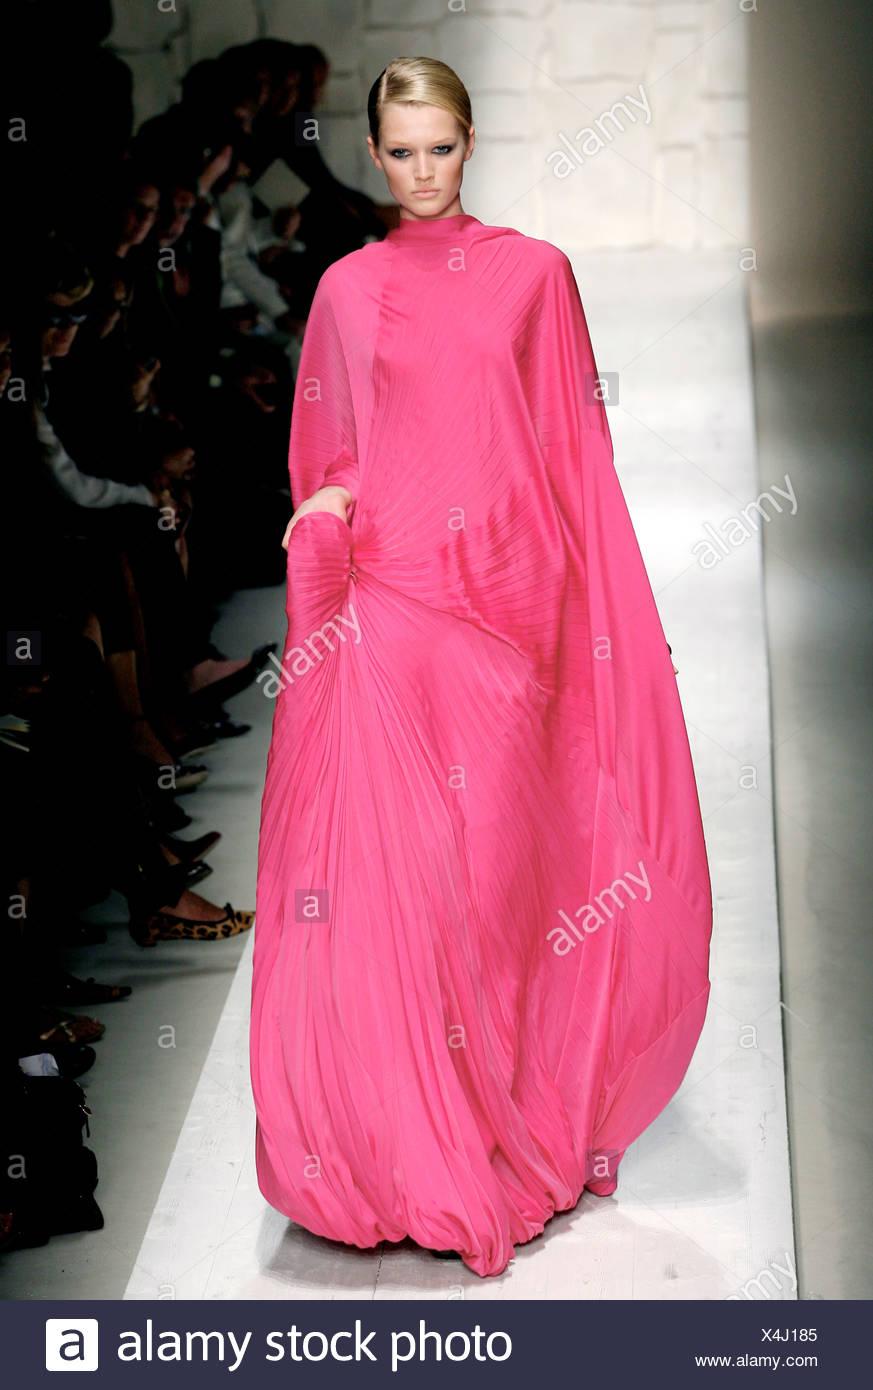 Engañoso comerciante seriamente  Salvatore Ferragamo Milan Ready to Wear Spring Summer Voluminous deep pink  pleated maxi gown Stock Photo - Alamy